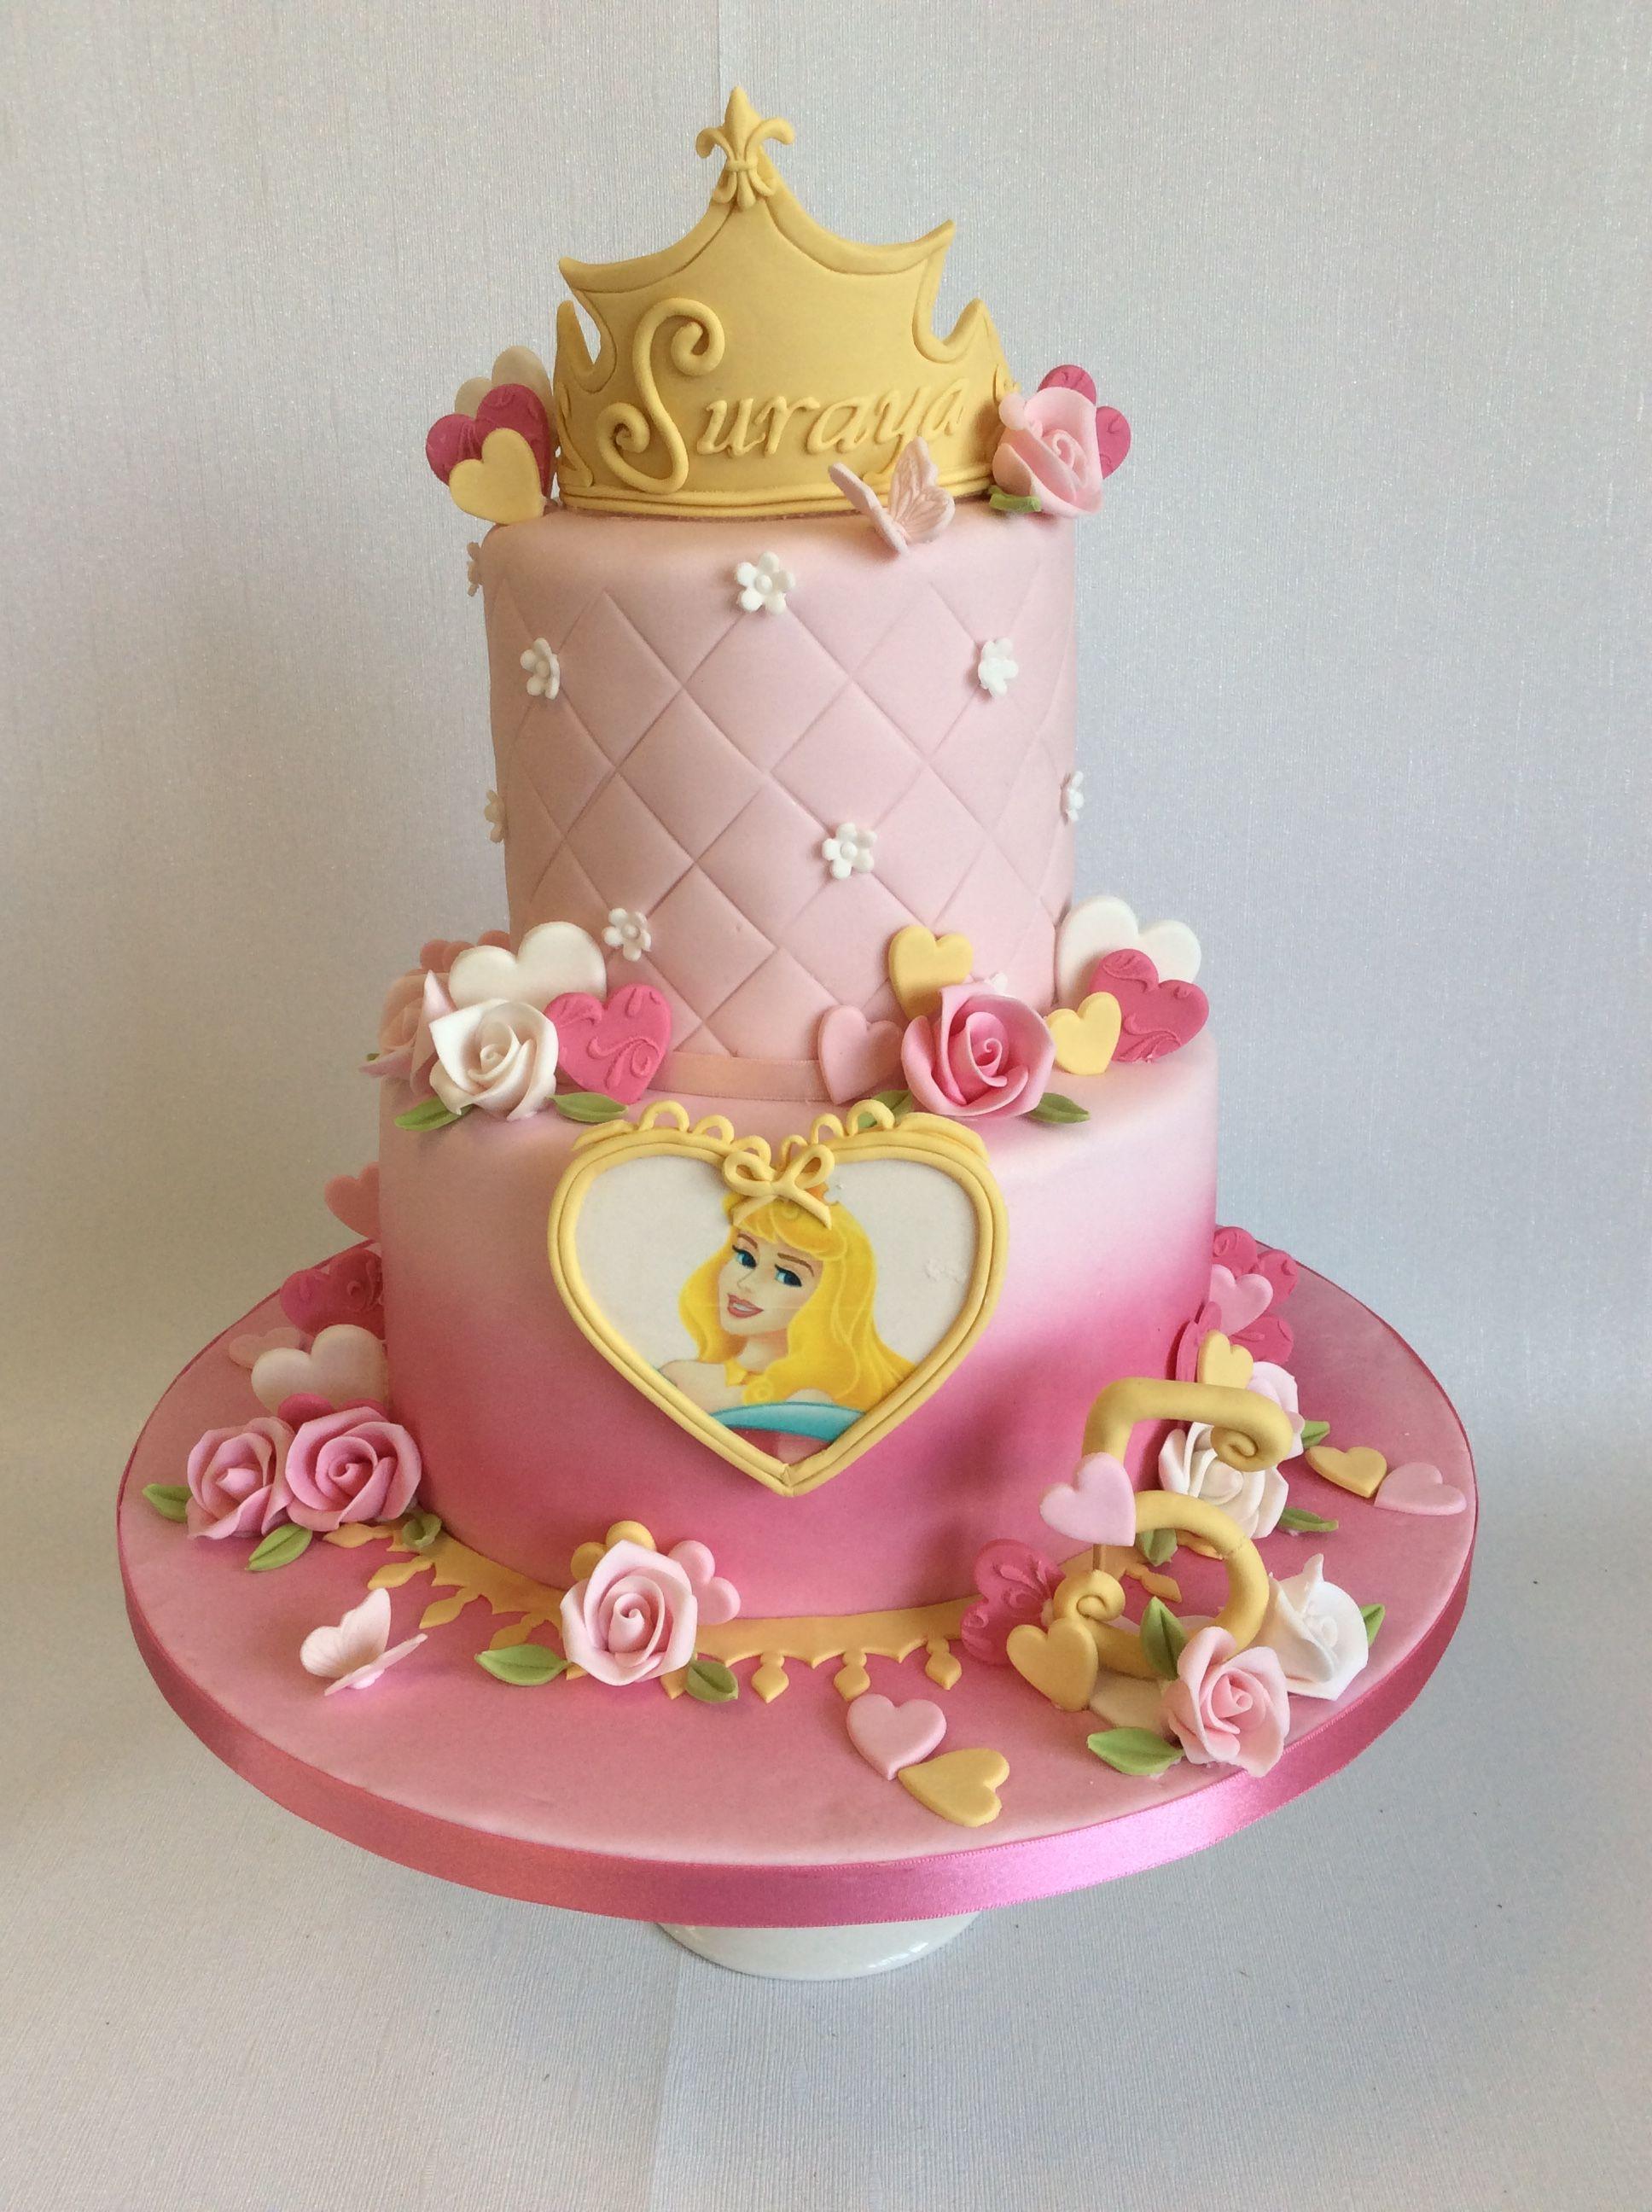 Fantastic 2 Tier Aurora Theme Birthday Cake With Images Disney Princess Funny Birthday Cards Online Inifofree Goldxyz